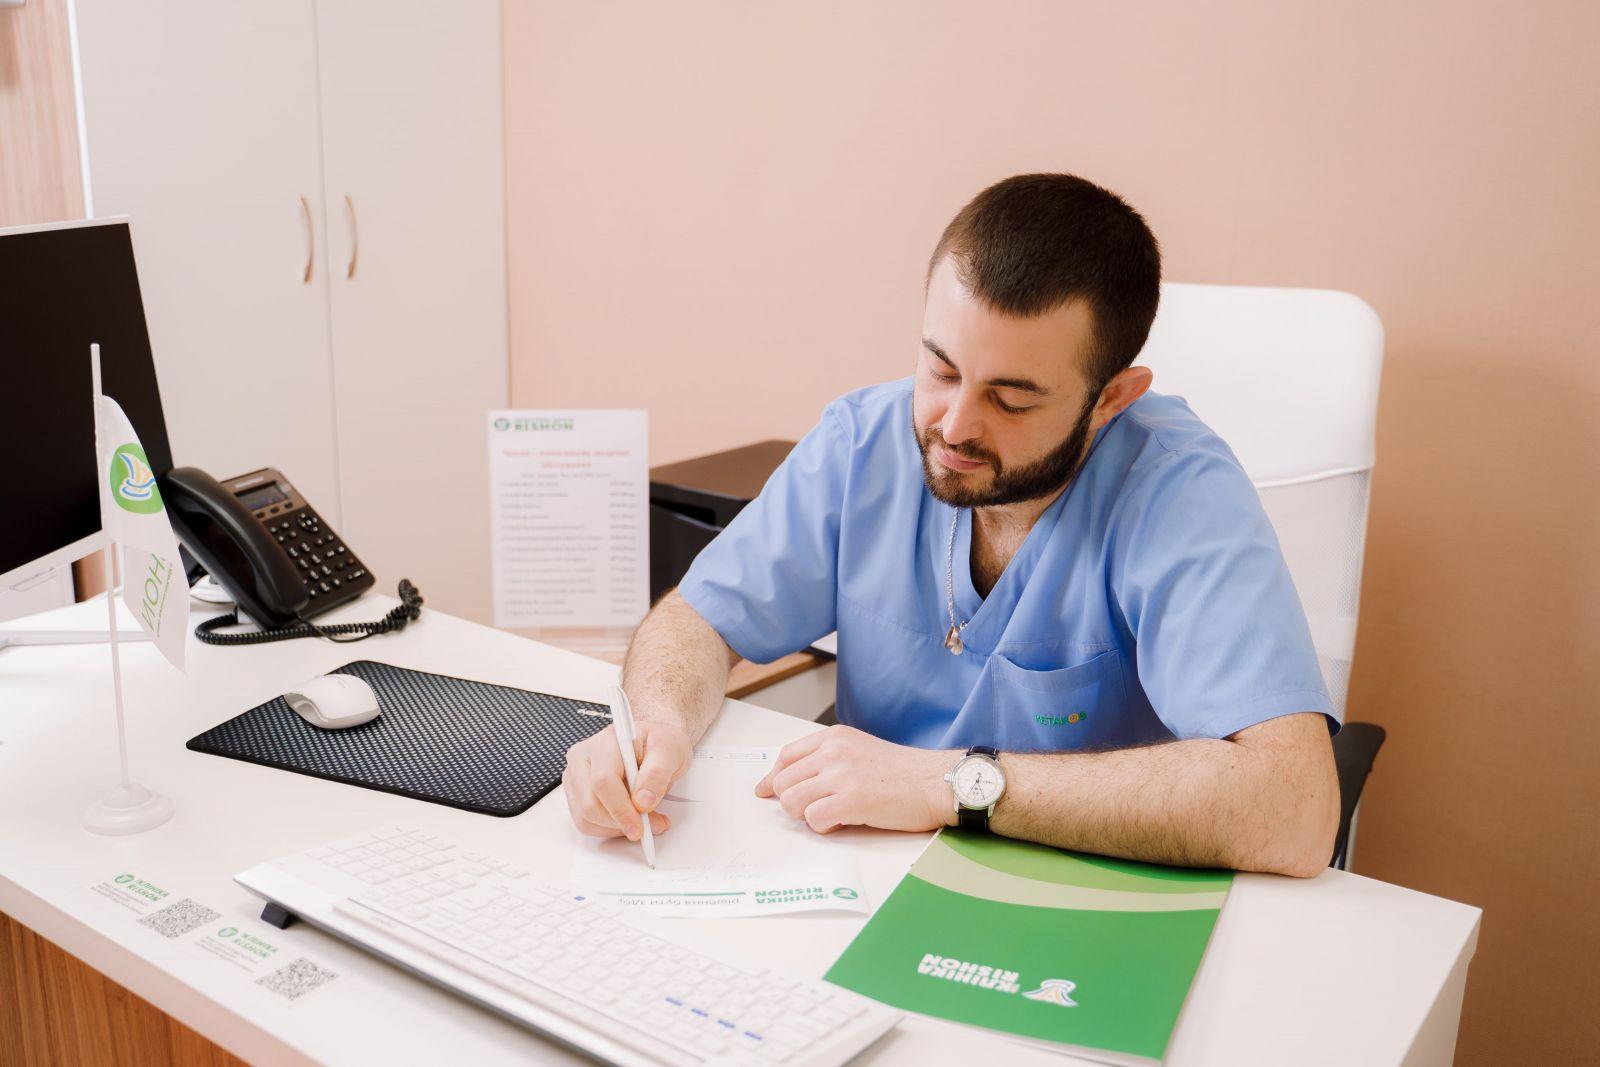 консультация уролога с УЗИ - 580 грн